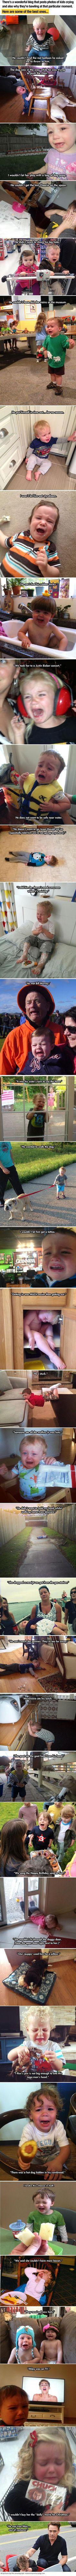 Lol. Toddler problems.